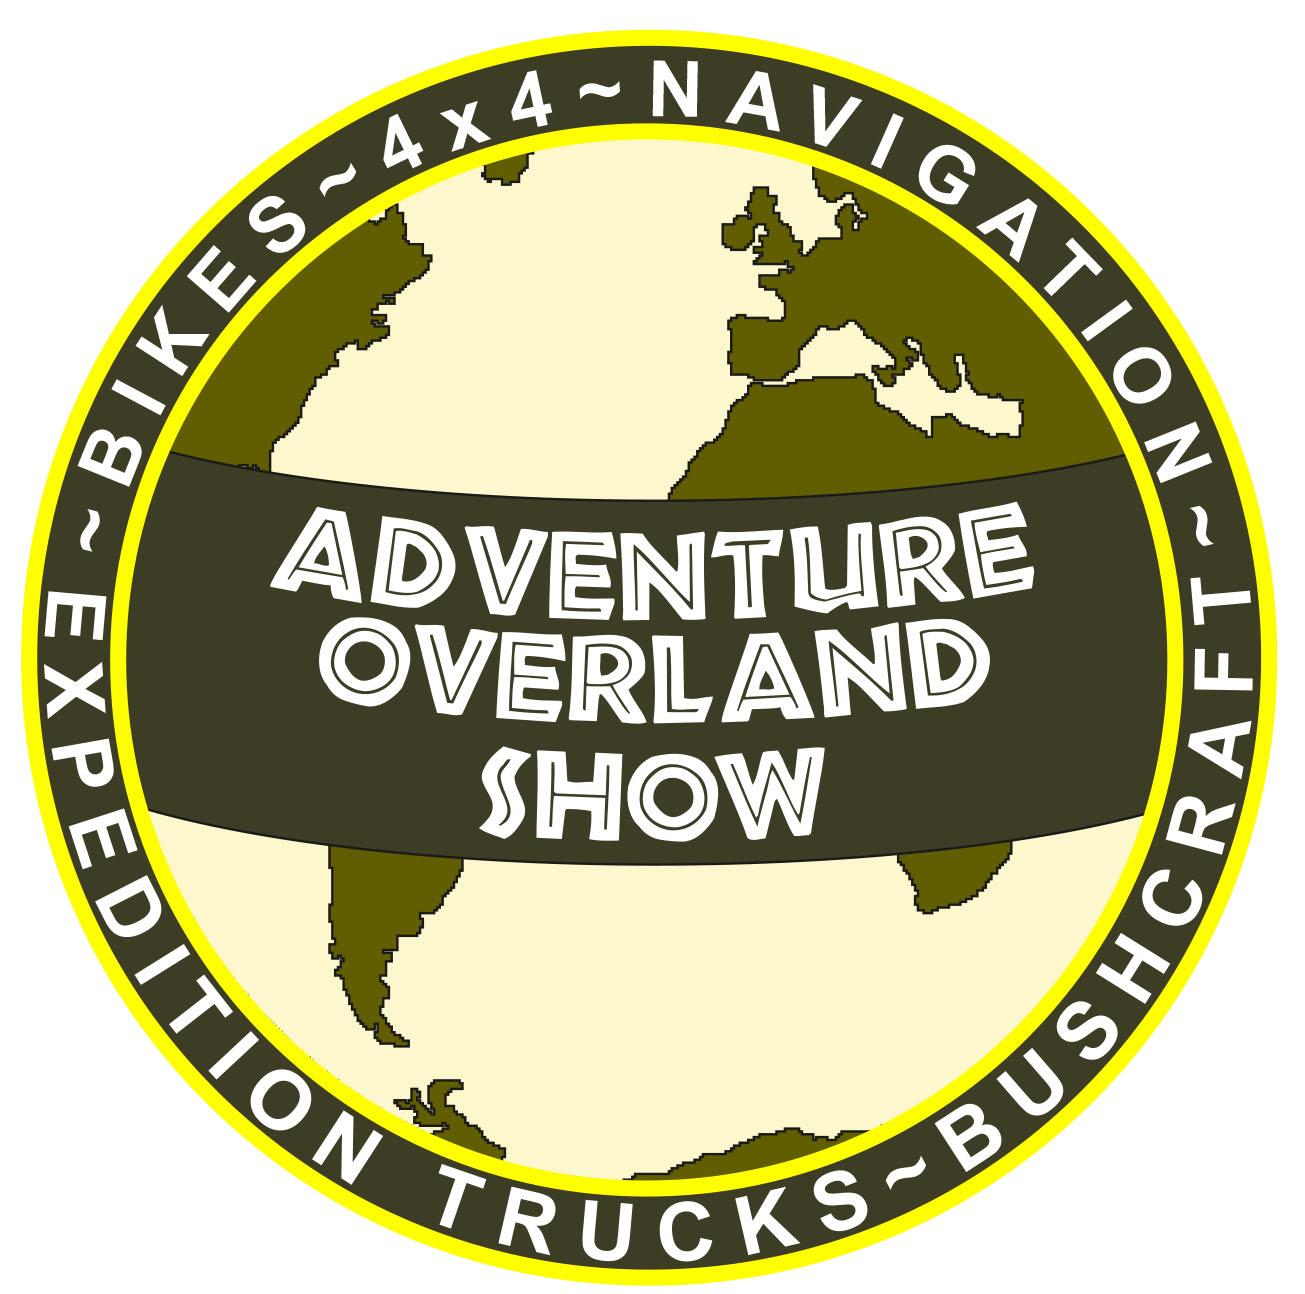 ADVENTURE OVERLAND + INTERNATIONAL CAMPERVAN 'LATE SUMMER' SHOW banner image